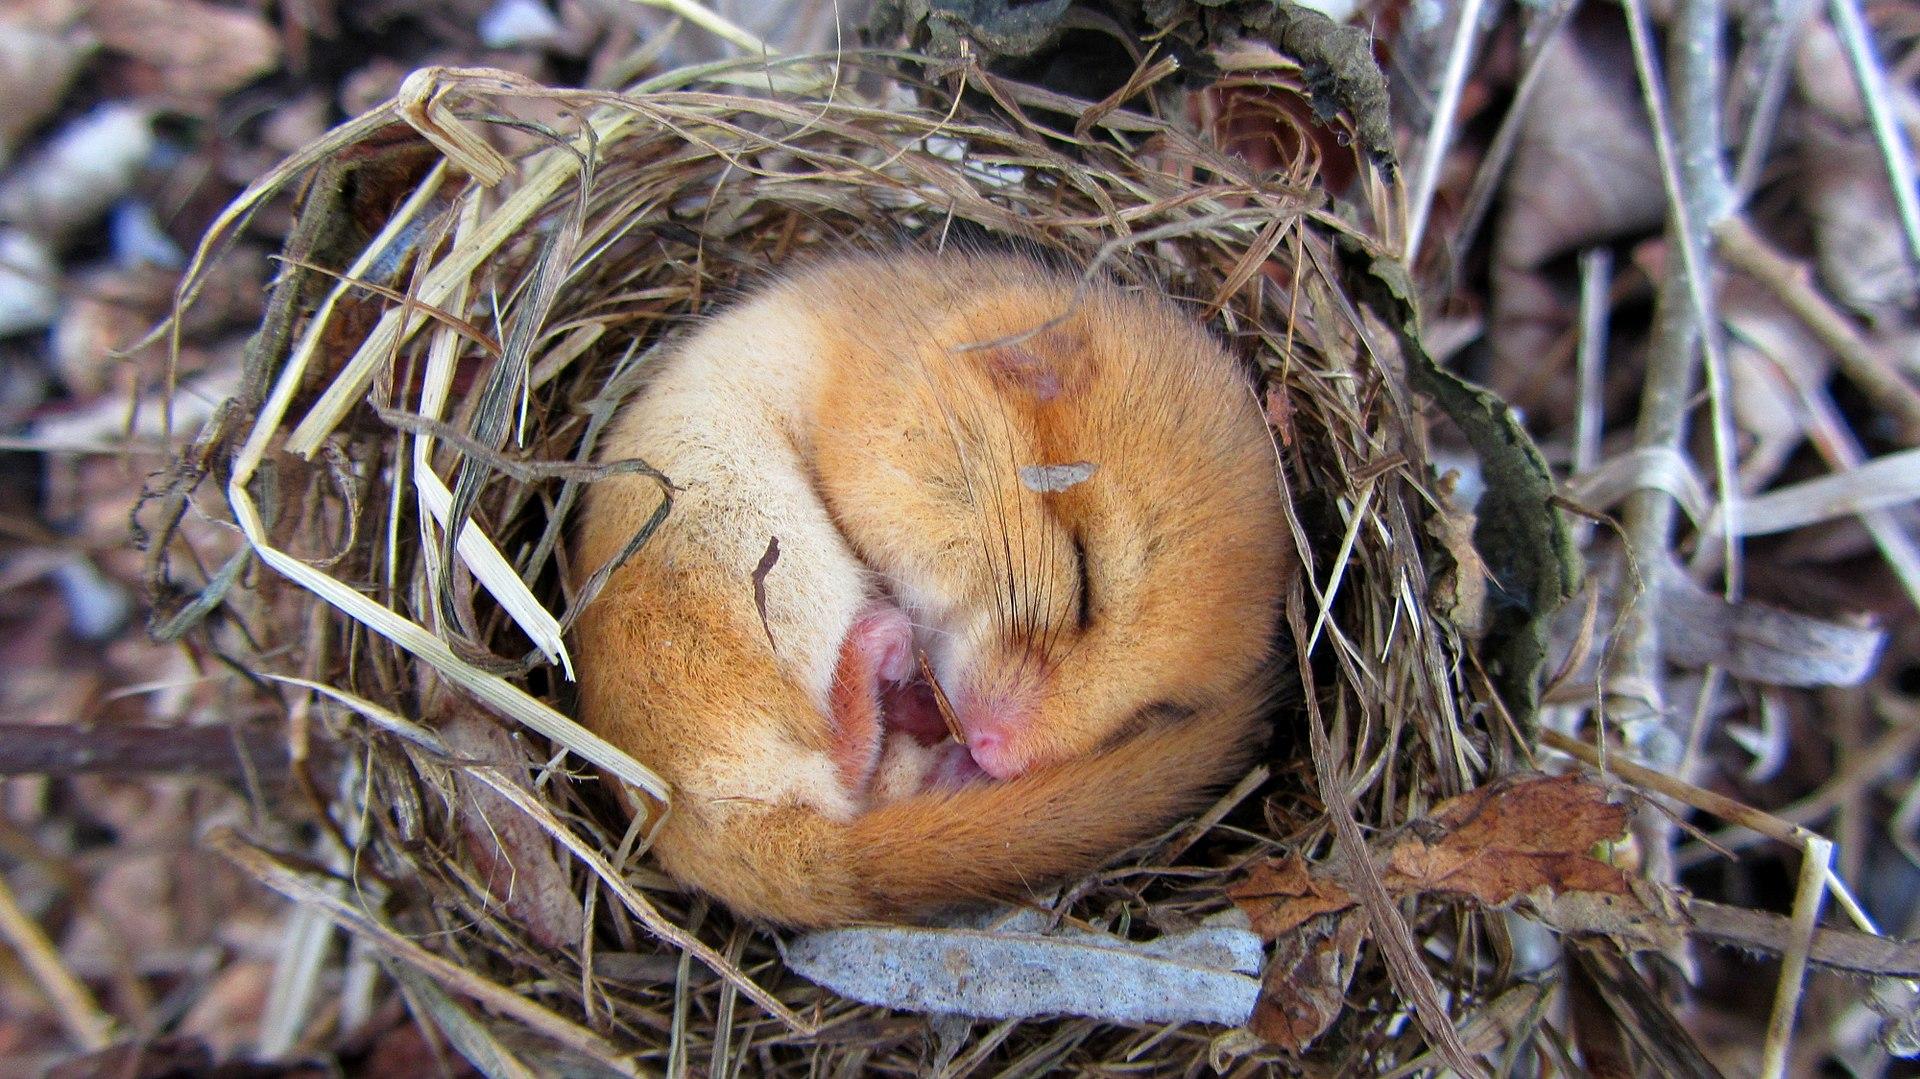 British Wildlife of the Week: Hazel Dormouse